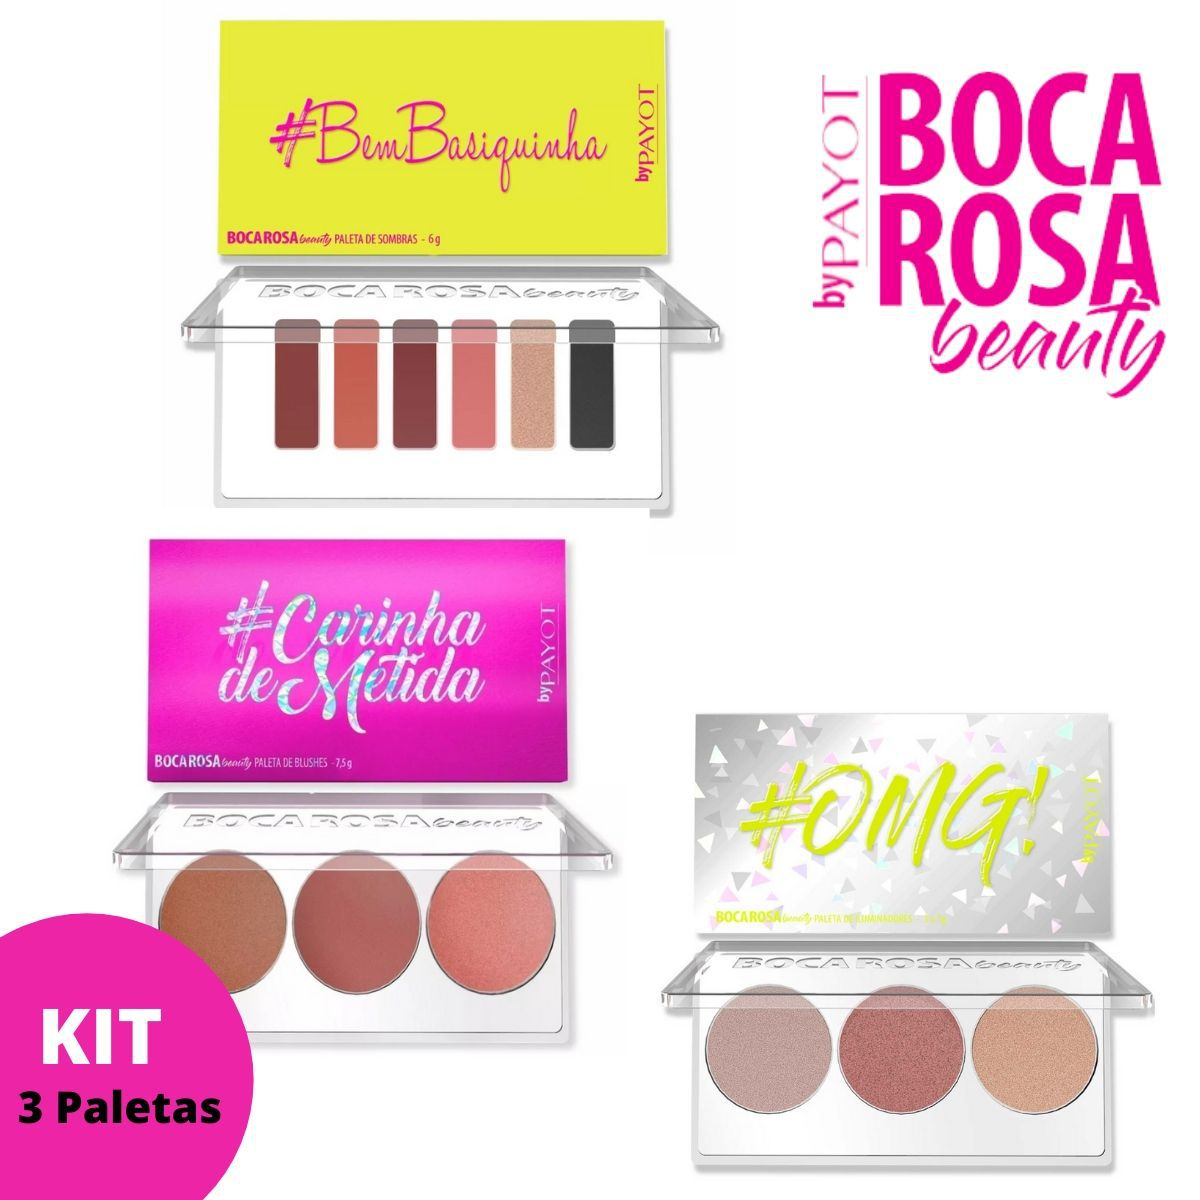 Kit 3 Paletas Boca Rosa ( #BemBasiquinha + OMG + Carinha de Metida)